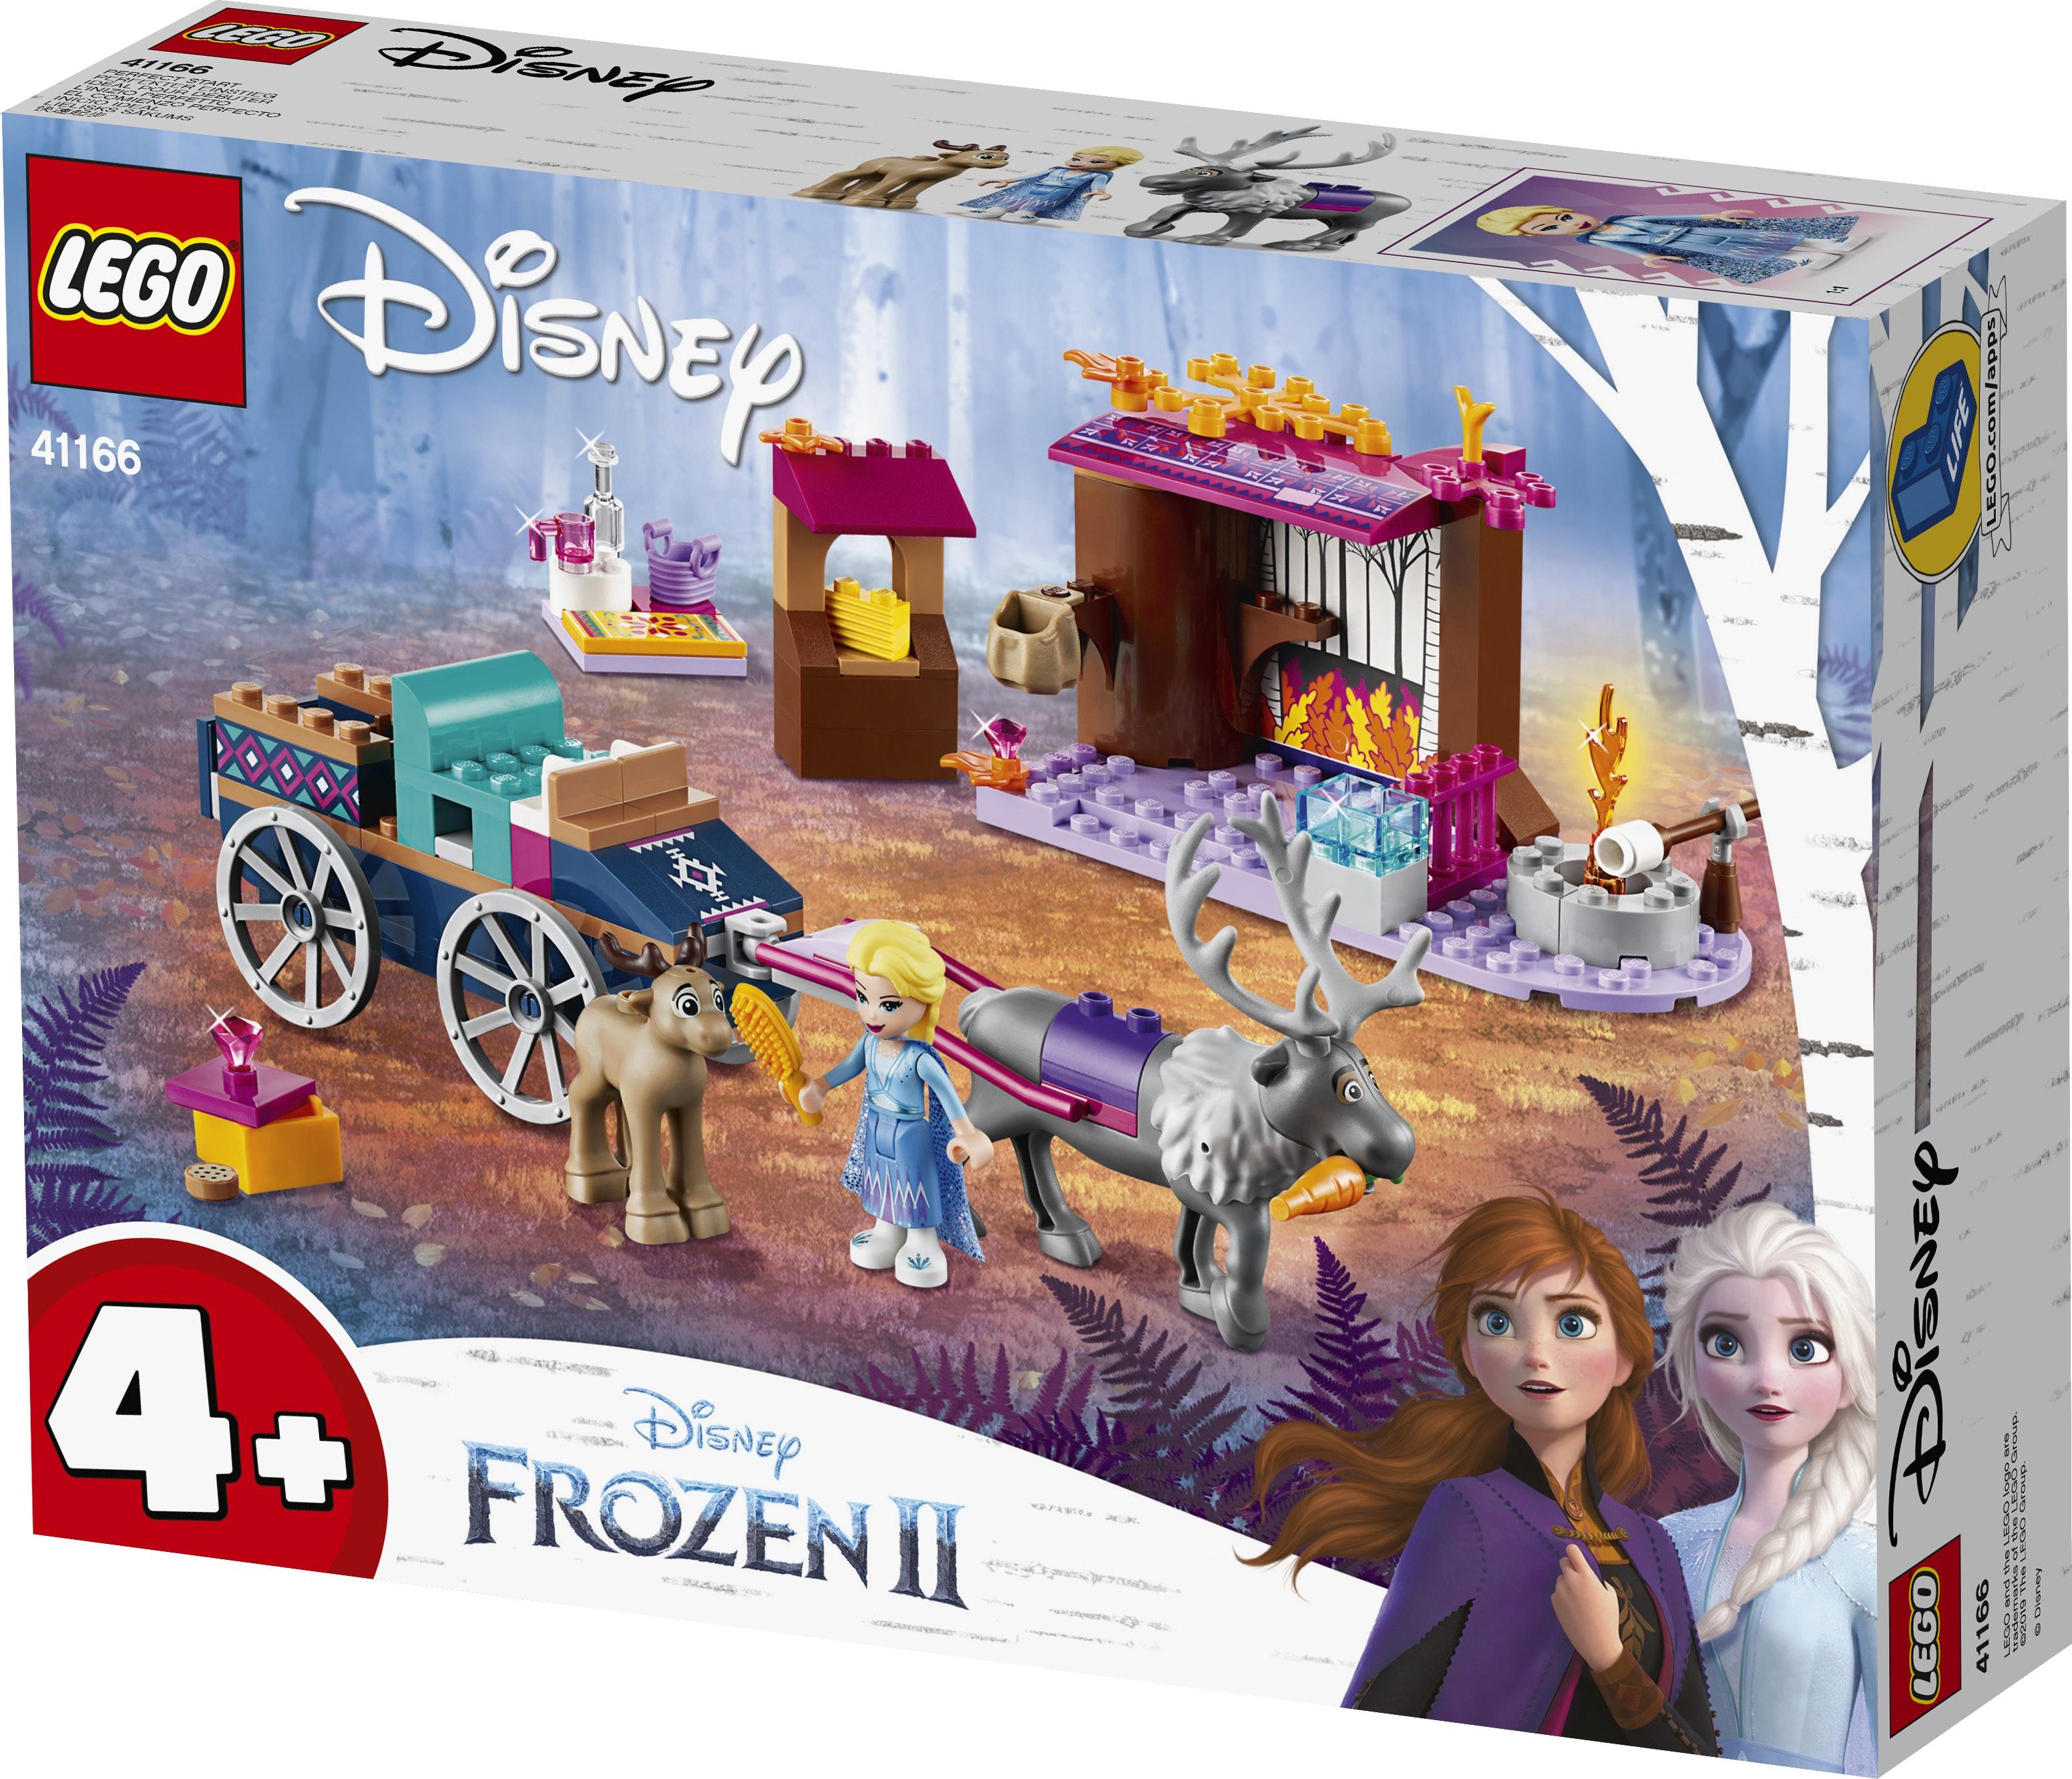 Lego 41166 Frozen 4 Elsa Koetsavontuur